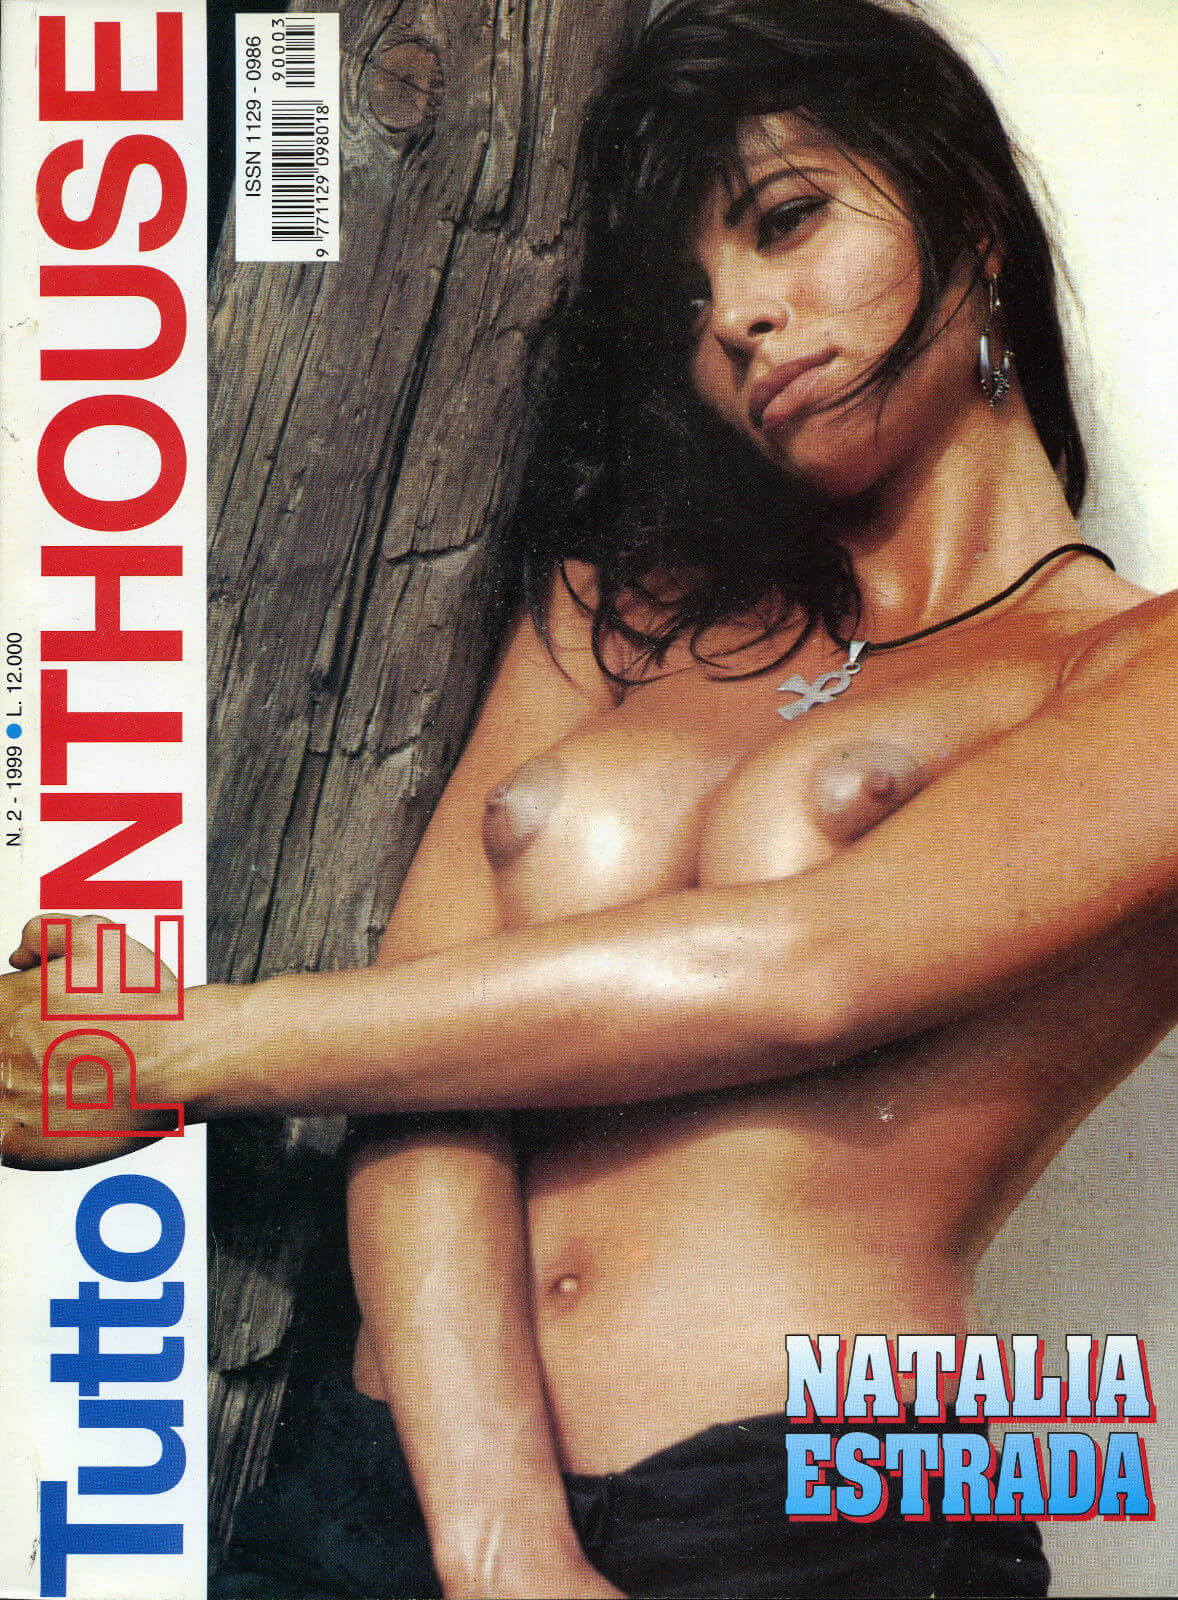 A lavoro nuda - 1 part 6